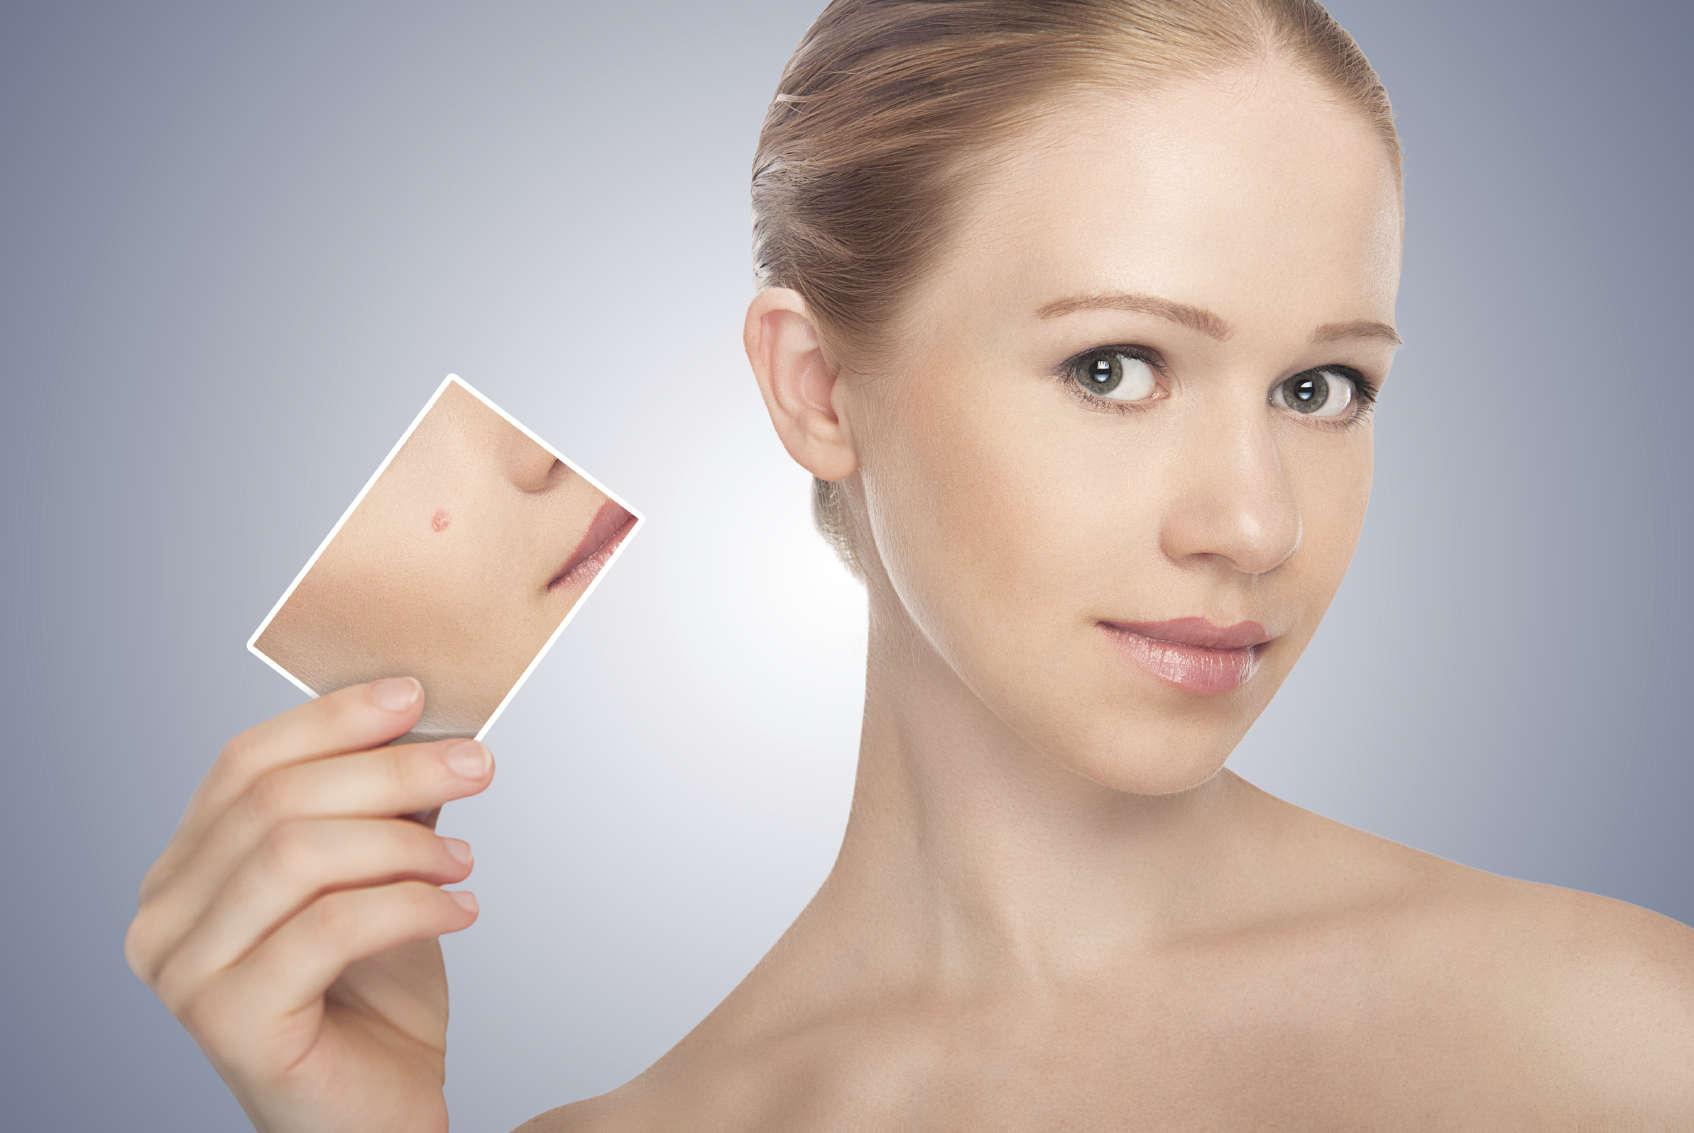 Tipo de acne do rosto